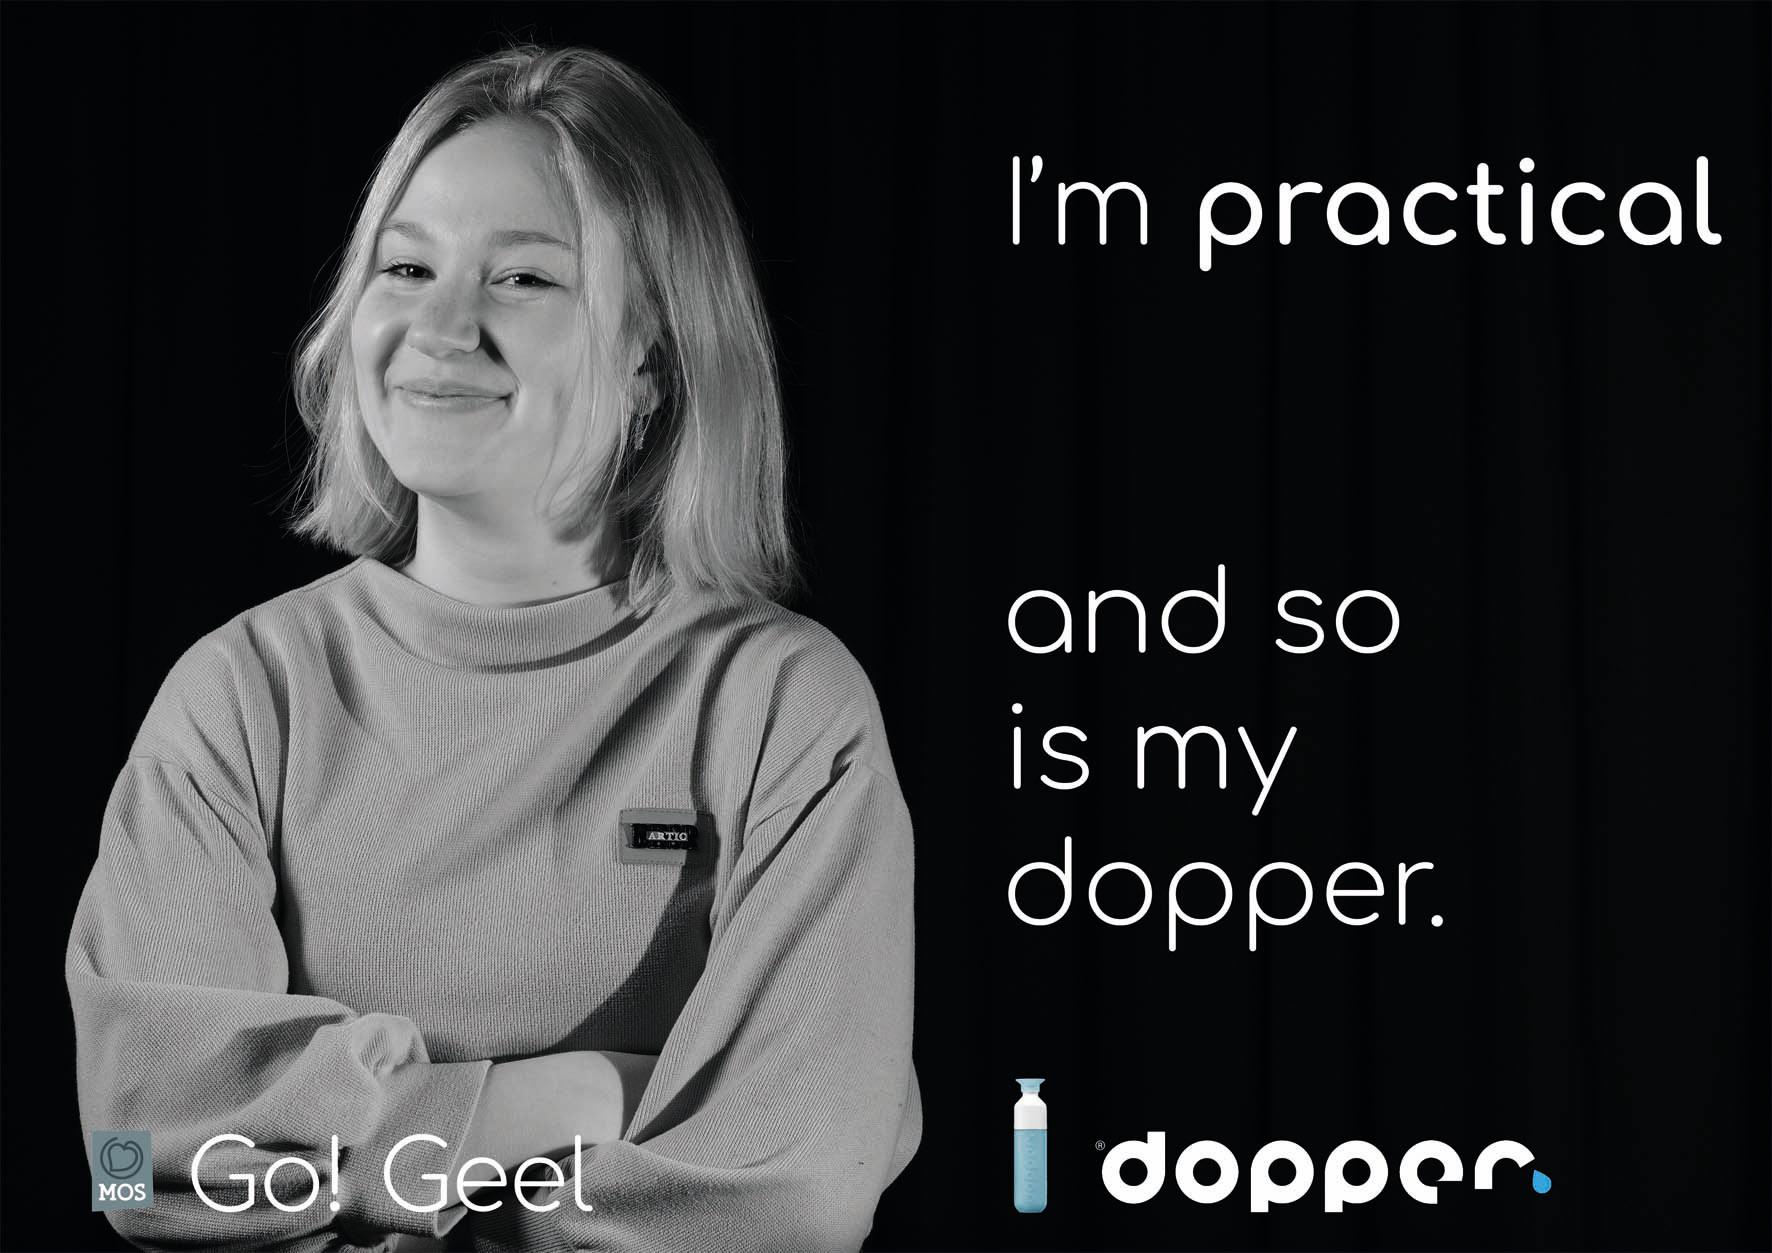 dopper campagne practical.jpg